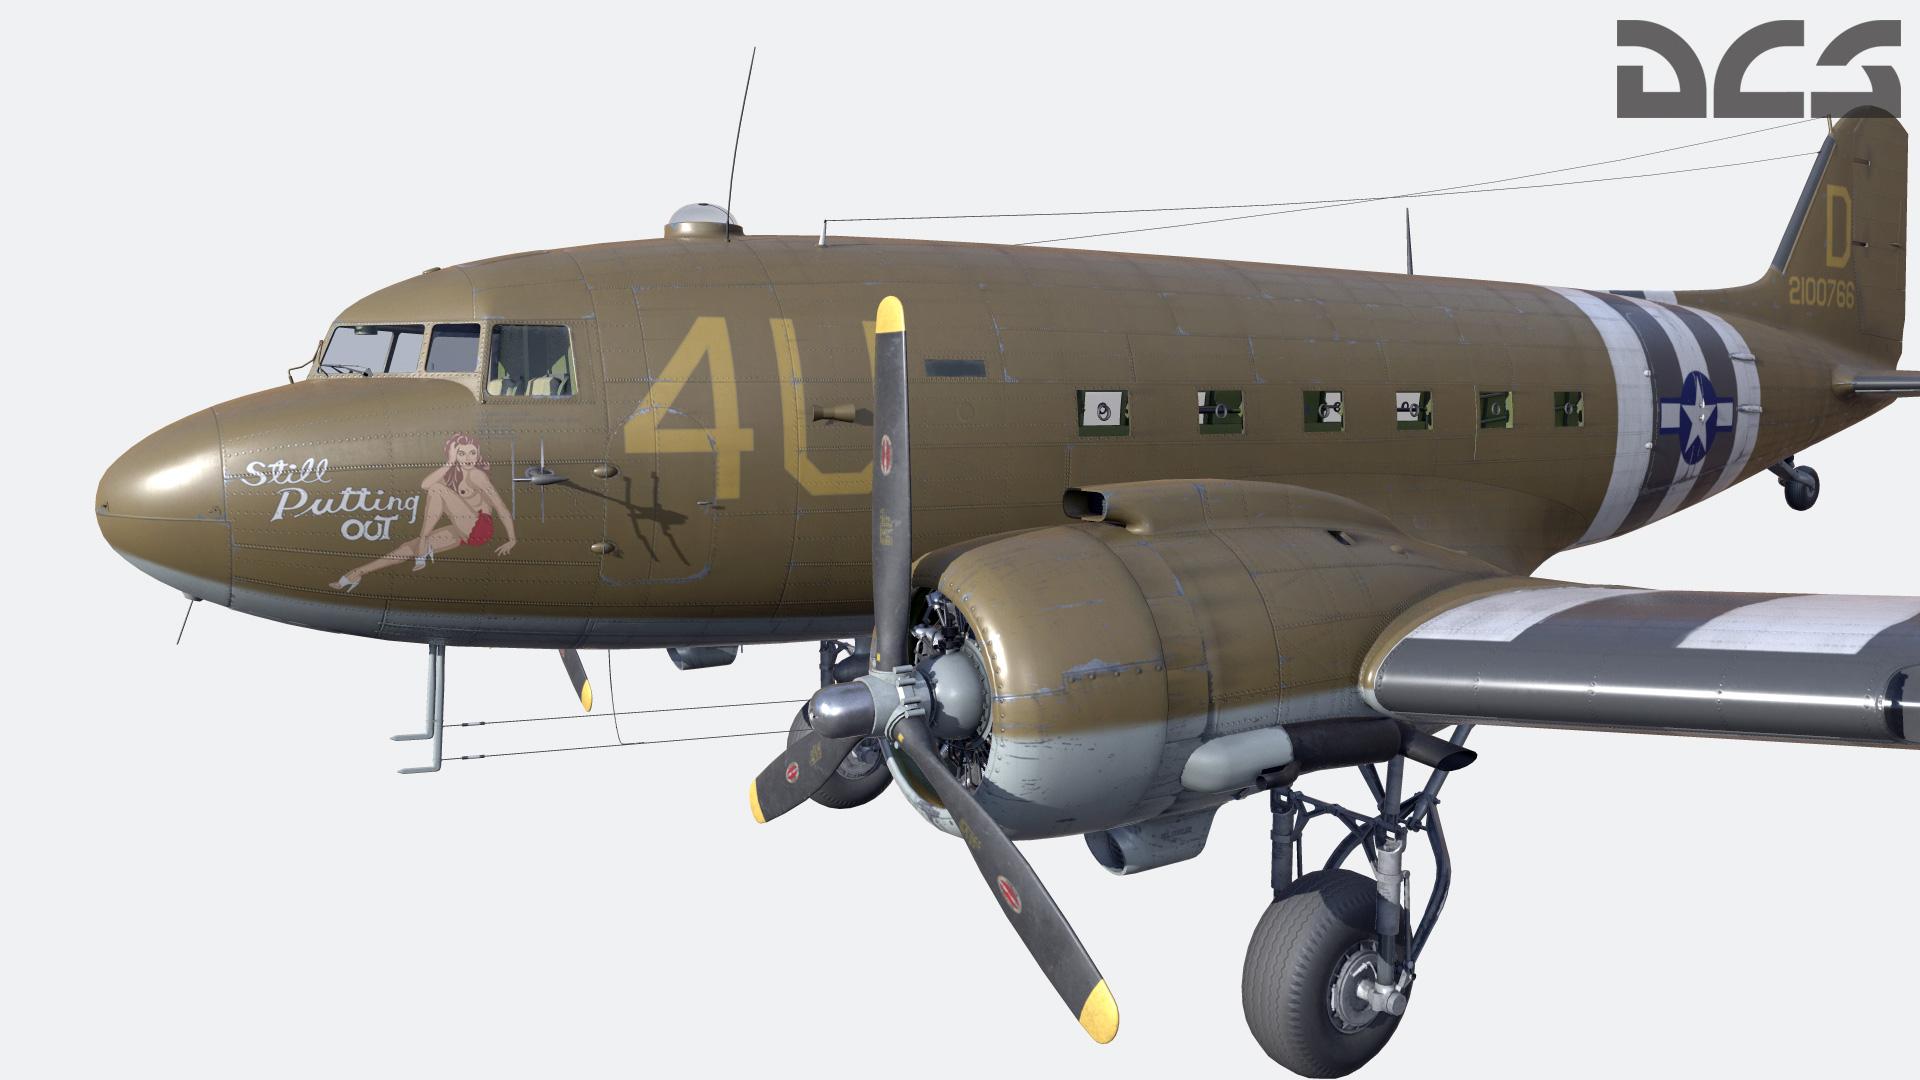 C-47-01